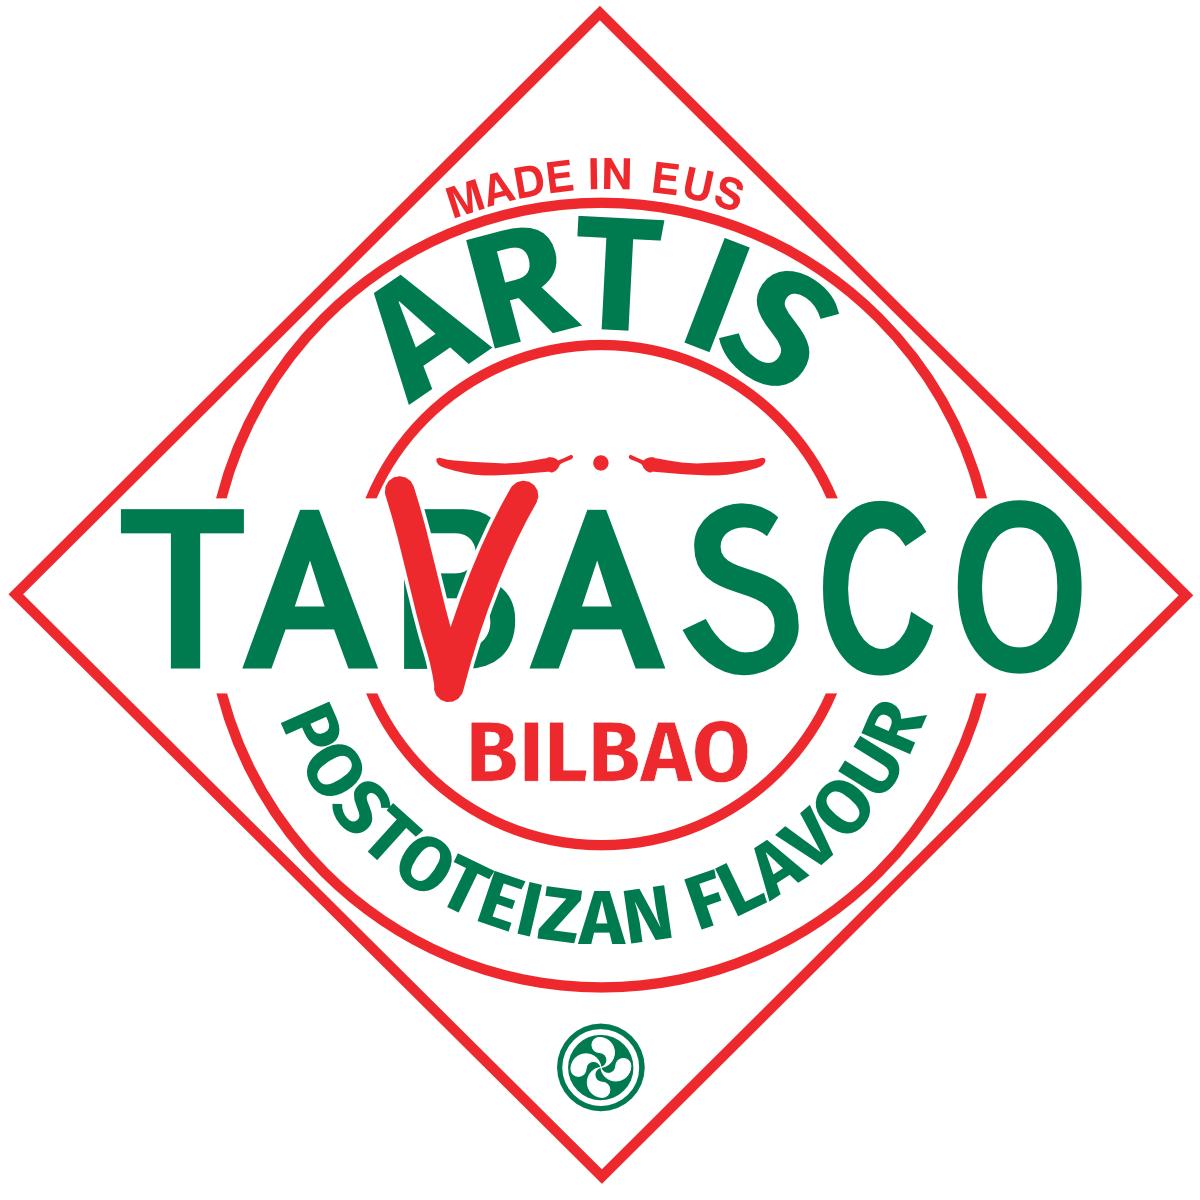 ART IS TABASCO